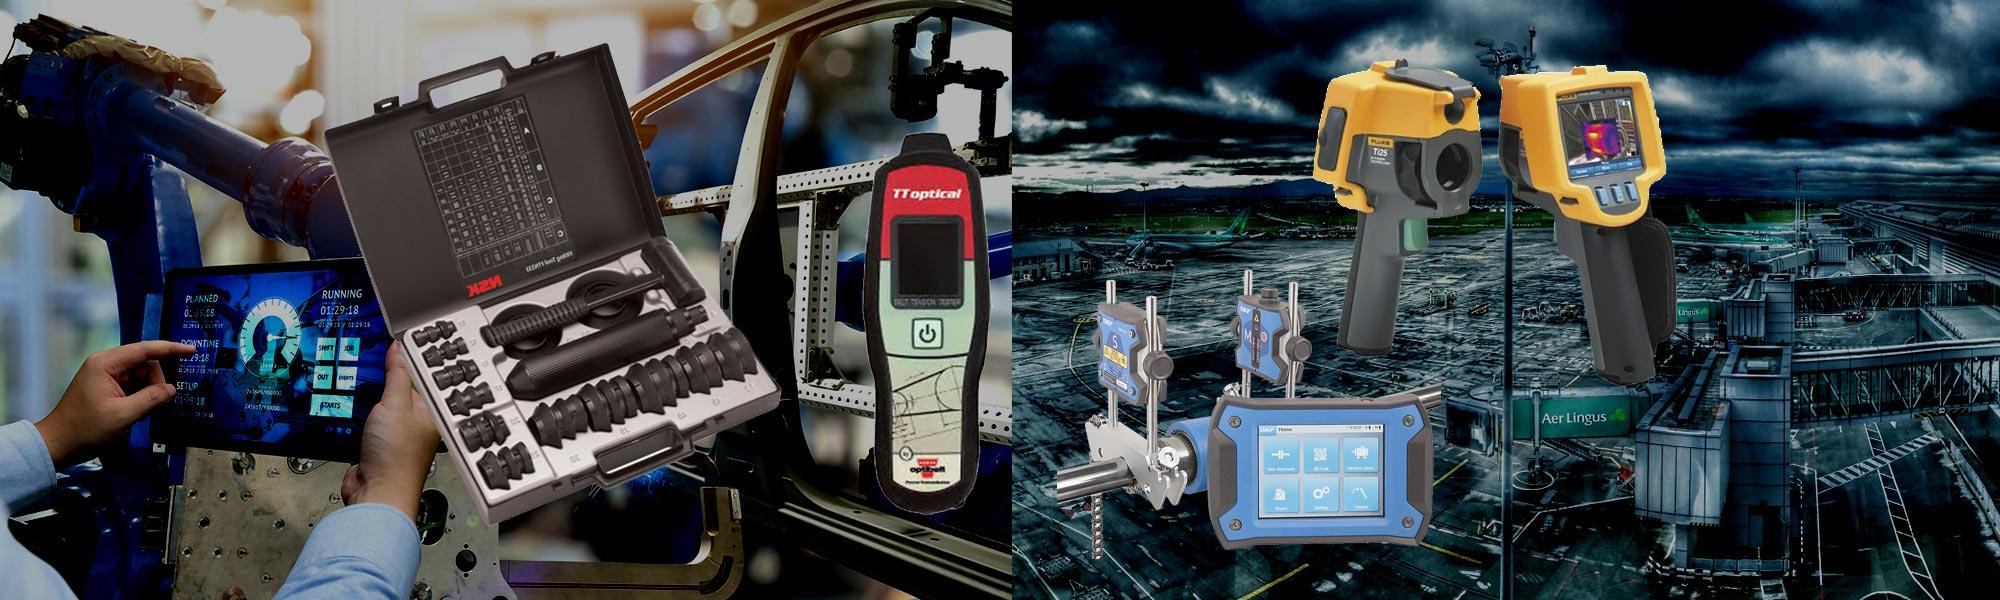 equipos de monitoreo industrial | Babachu